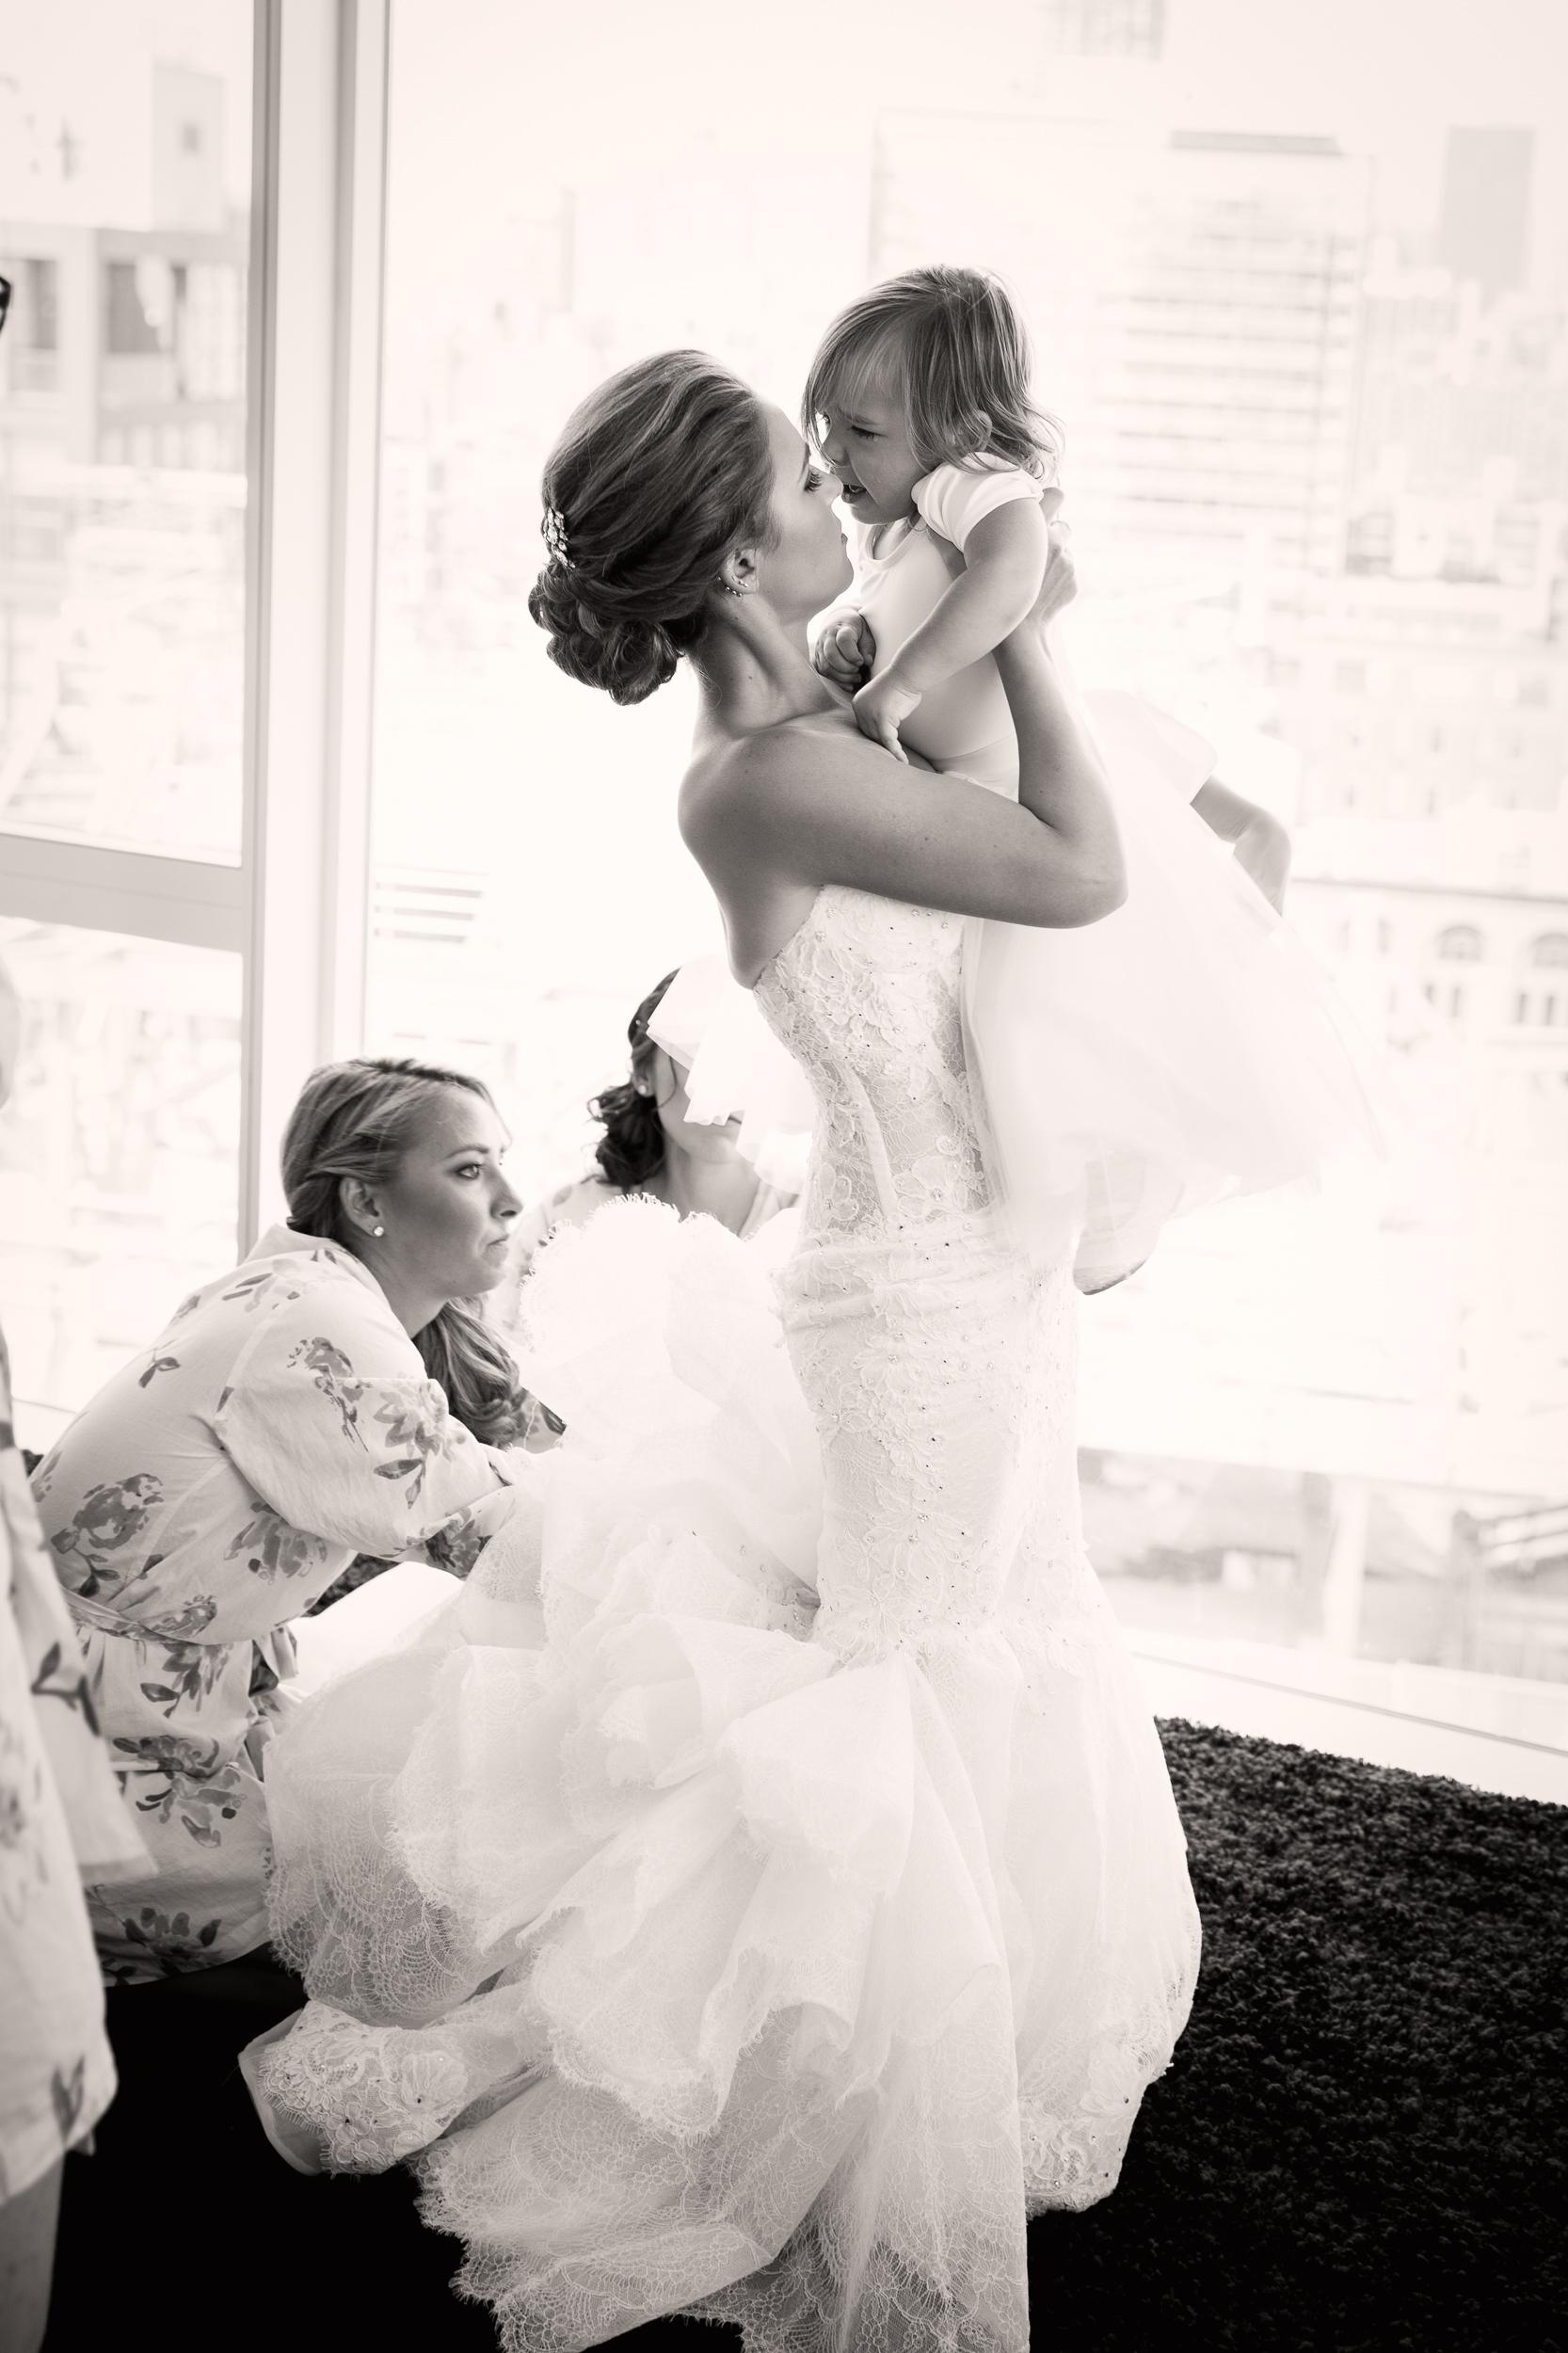 Ceci_New_York_Style_Luxury_Custom_Summer_Wedding_CeciBride_Letterpress_NewYork_Foil_Lighthouse_Chelsea_Piers_7.jpg